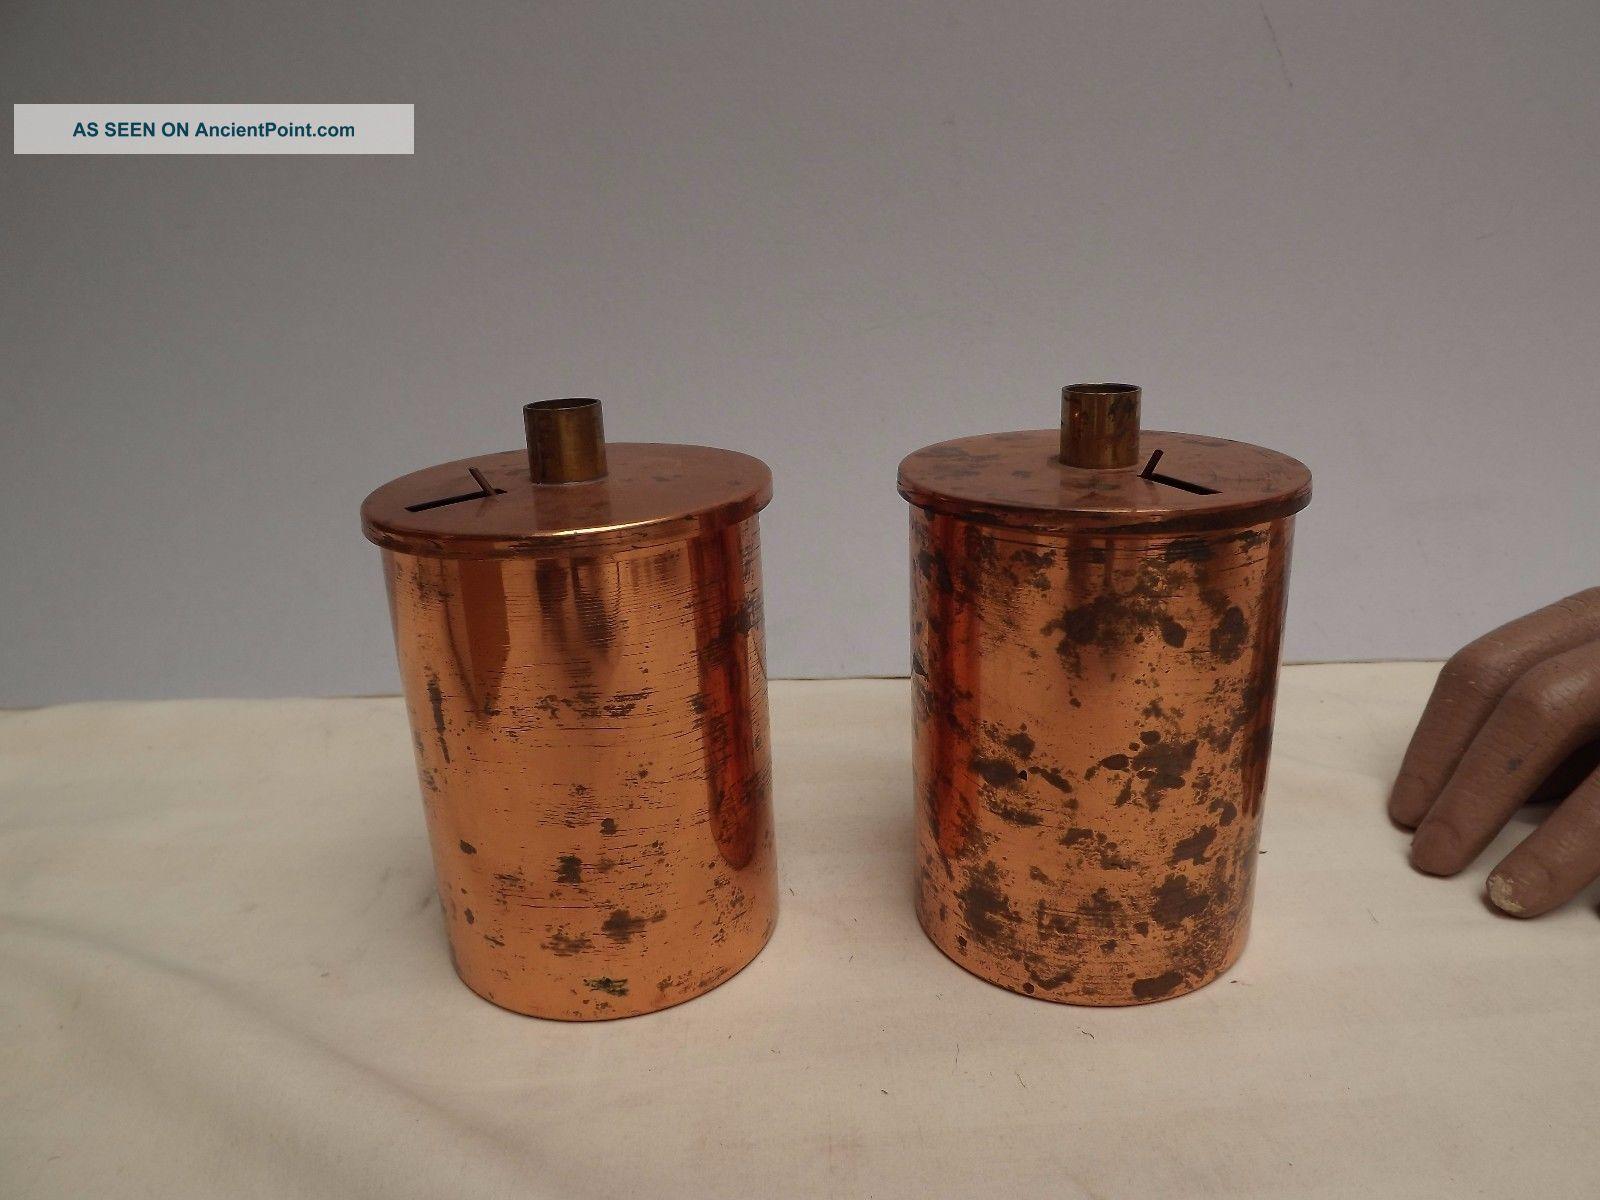 Calorimeter Can ( (copper))  C1930 Other Antique Science Equip photo